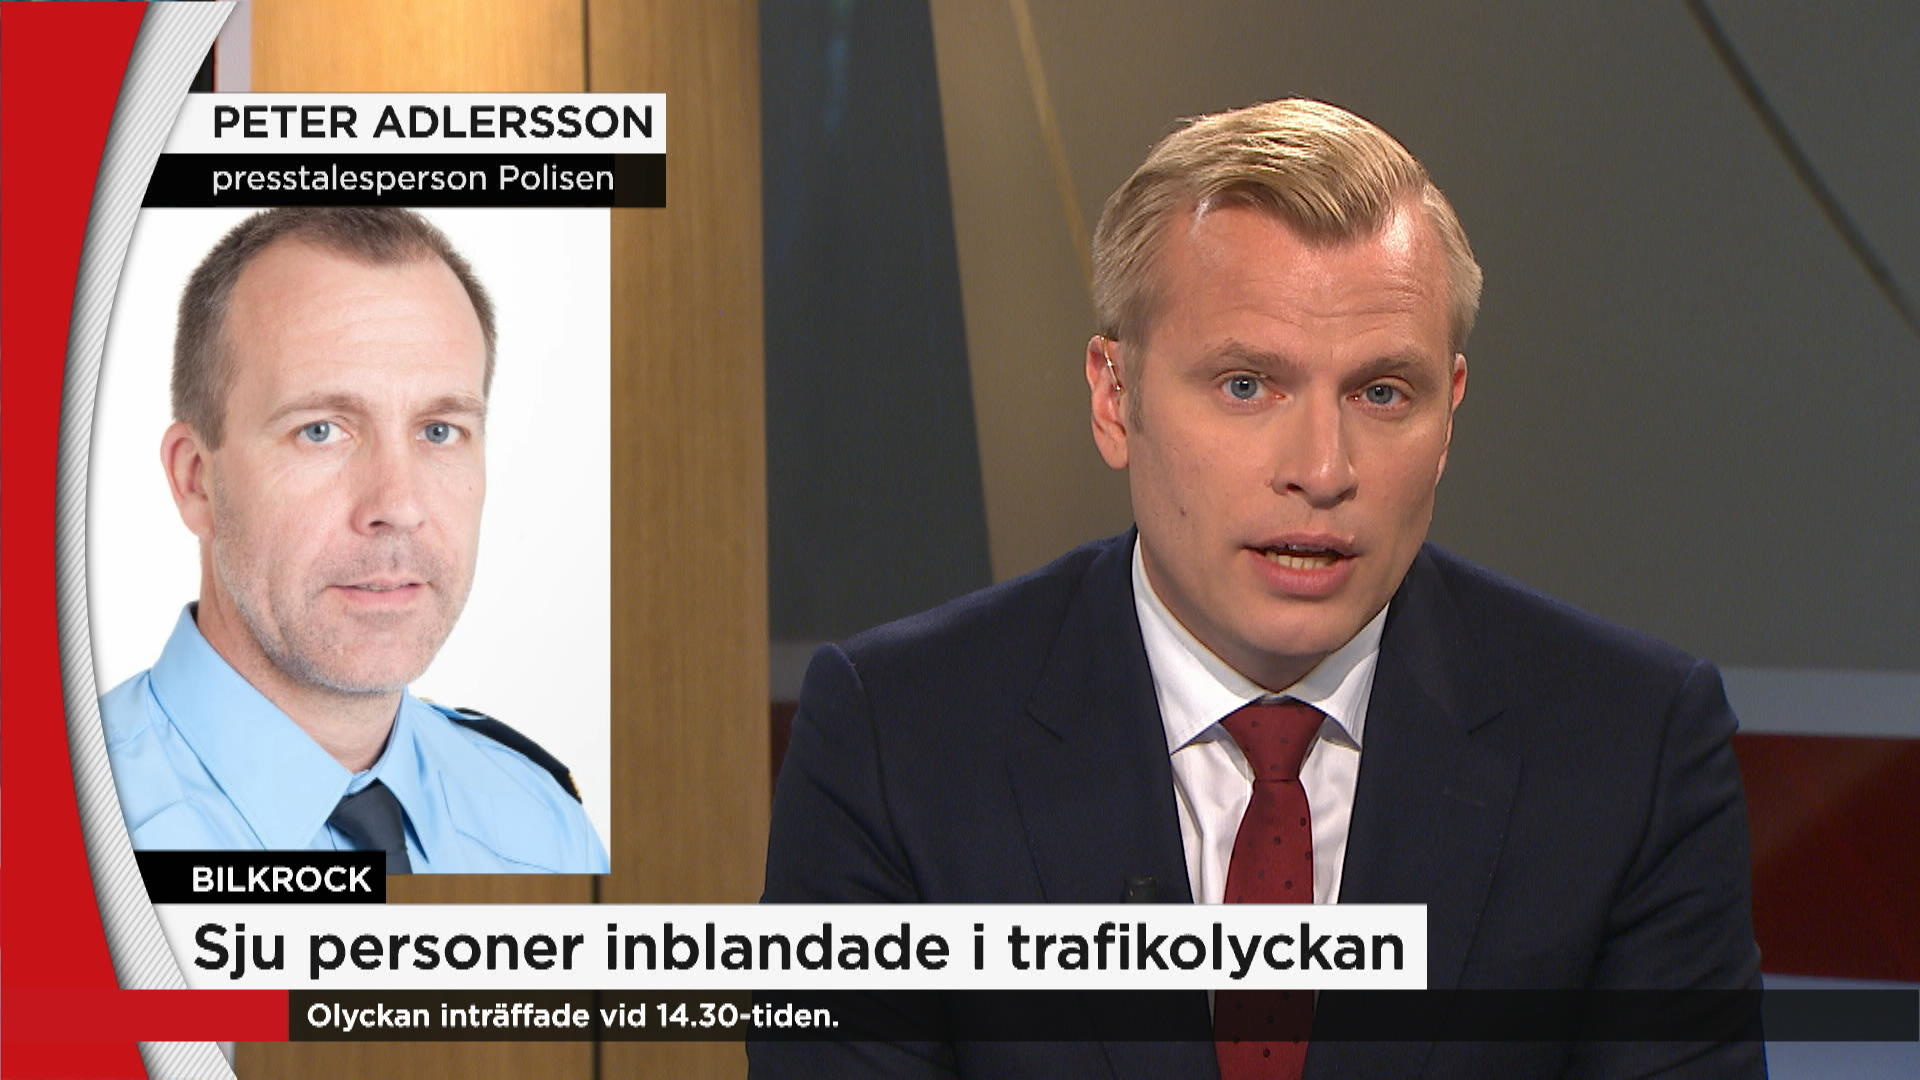 Carina Lindgren, Hestra Stenkullen 1, Tranemo | patient-survey.net